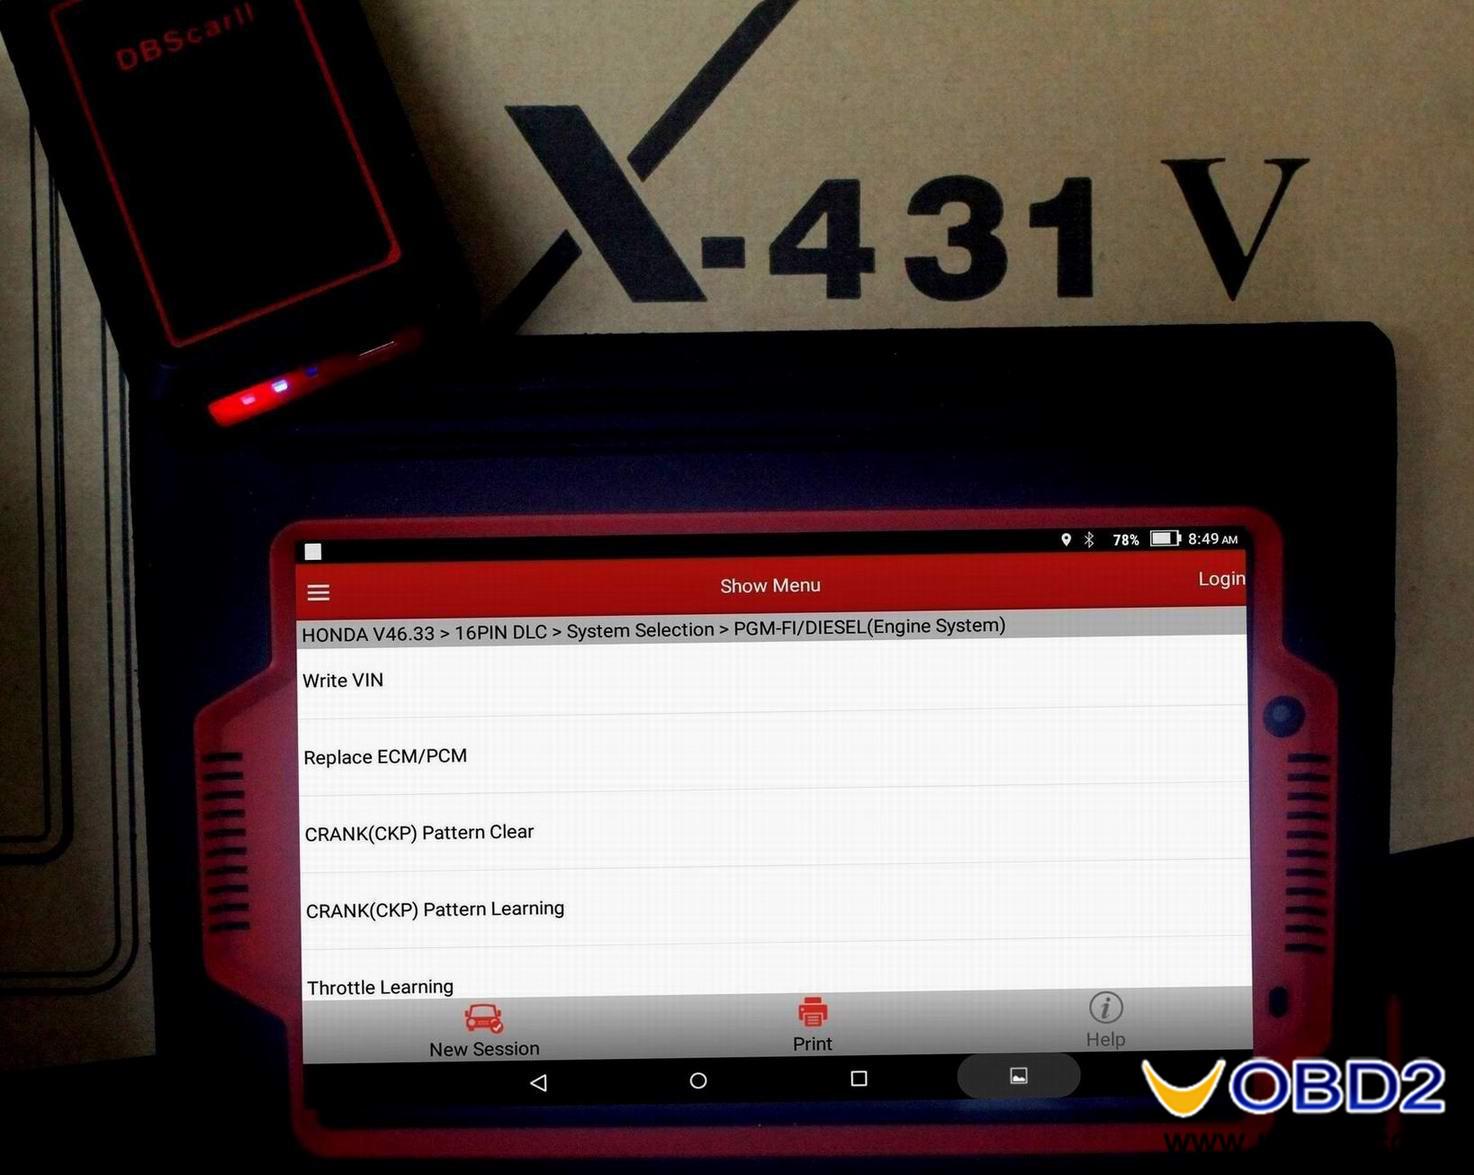 launch-x431-v-8-inch-diagnostic-tablet-honda-1